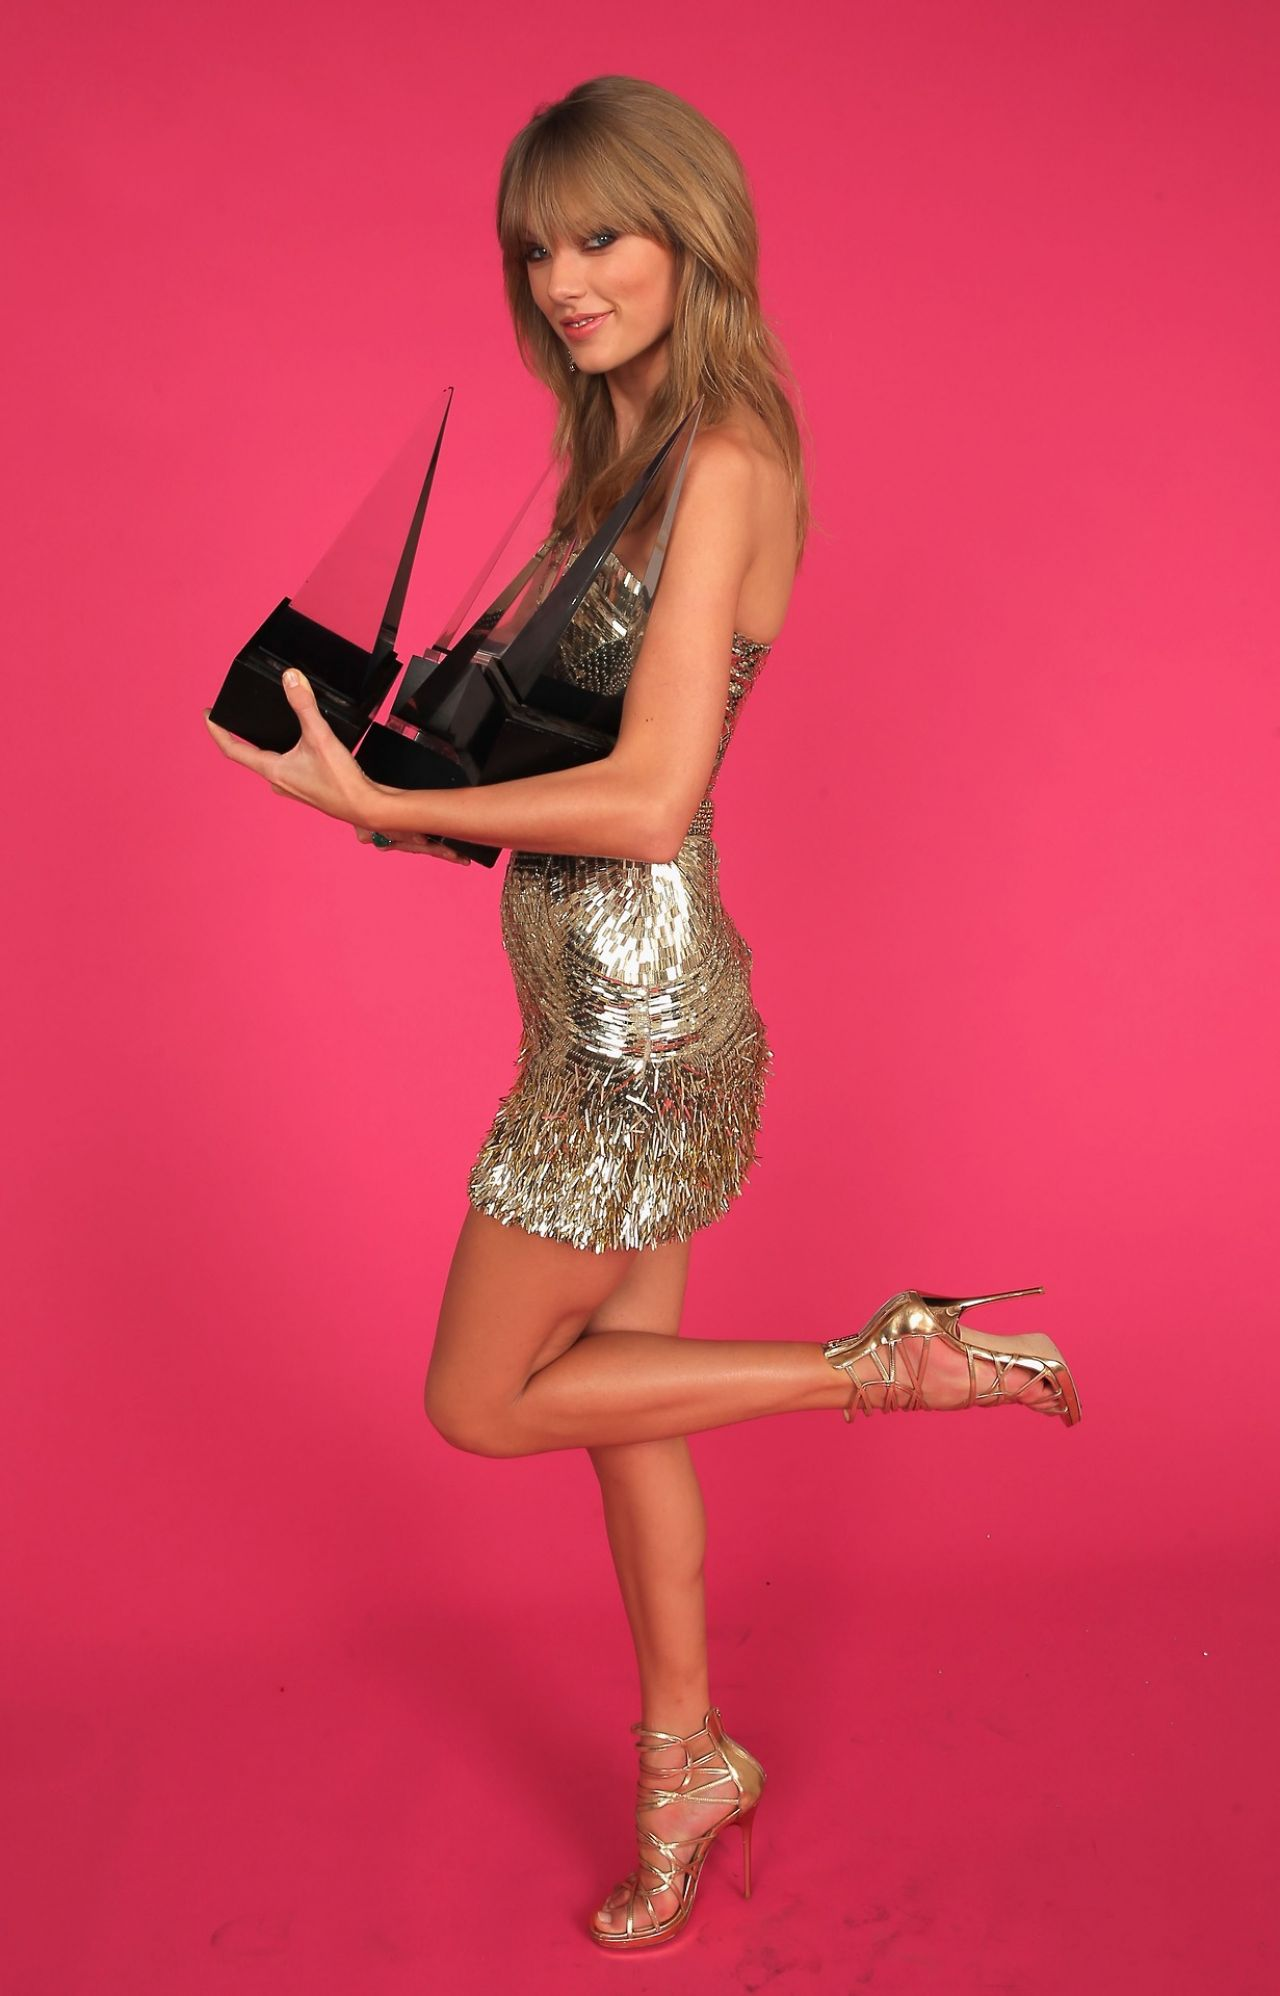 Taylor Swift Photoshoot 2013 American Music Awards Portraits